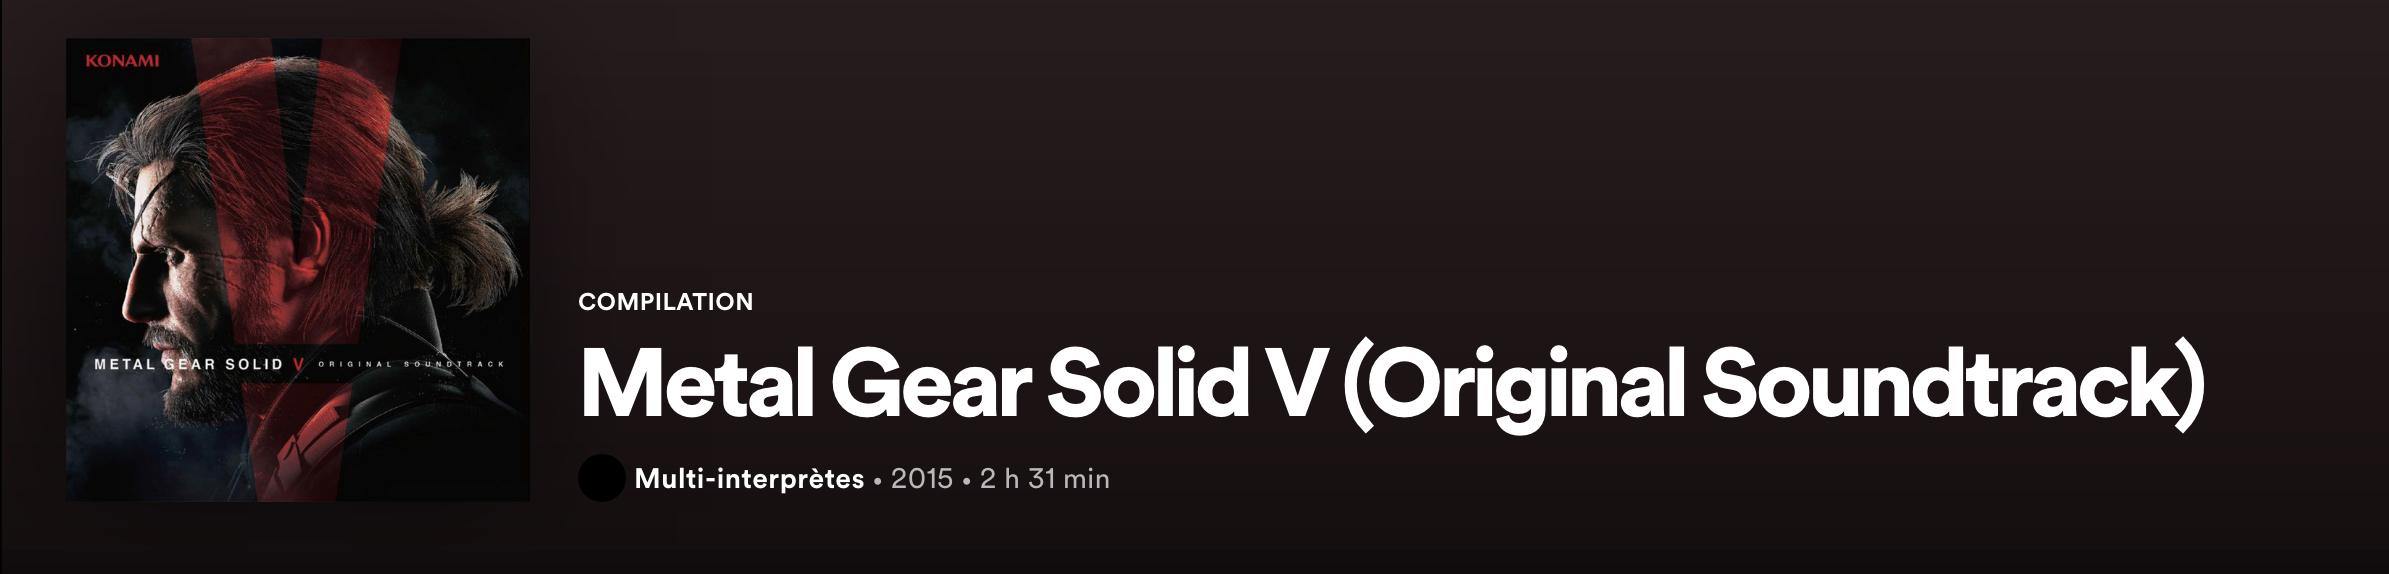 Metal Gear Solid V Spotify